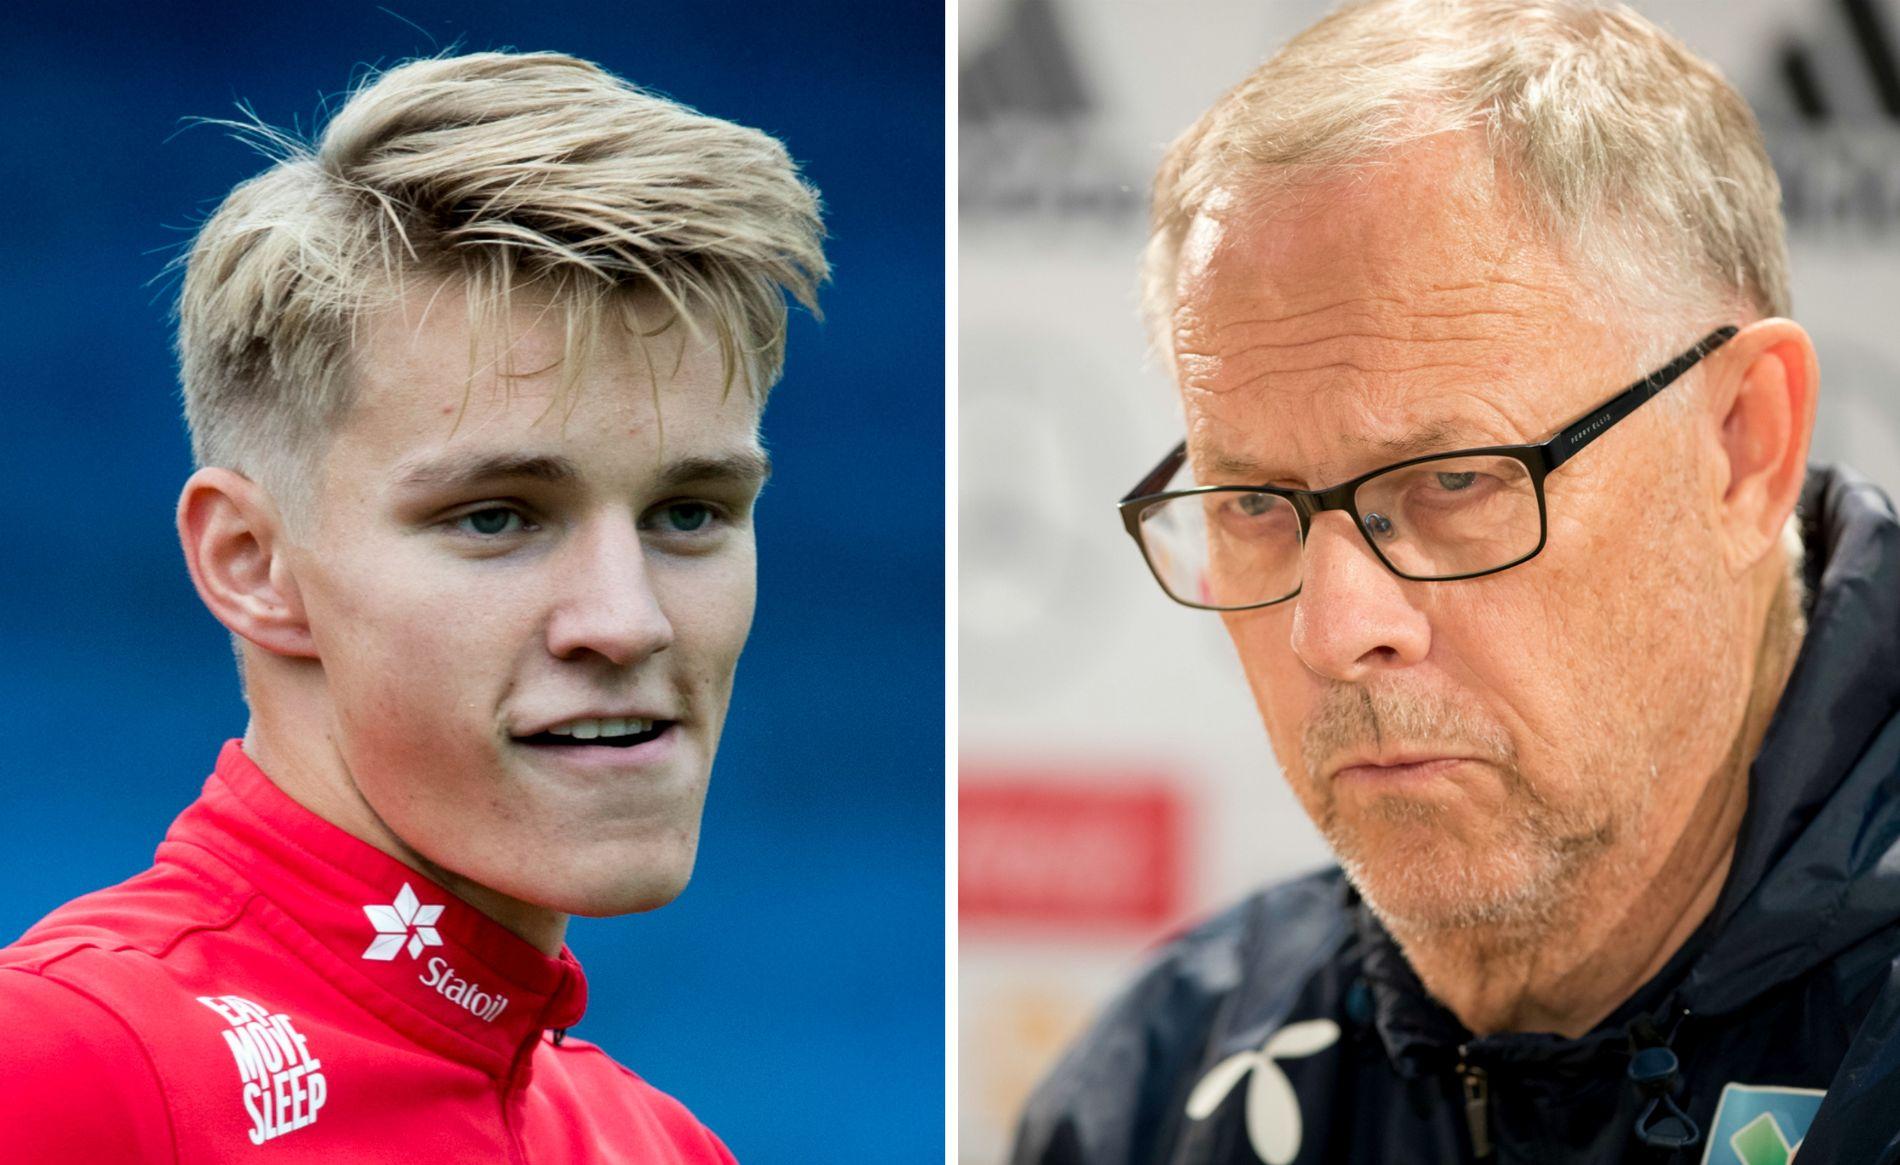 SNAKKER IKKE: Martin Ødegaard (t.v.) sier at han kun så vidt har hørt noe fra landslagssjef Lars Lagerbäck.